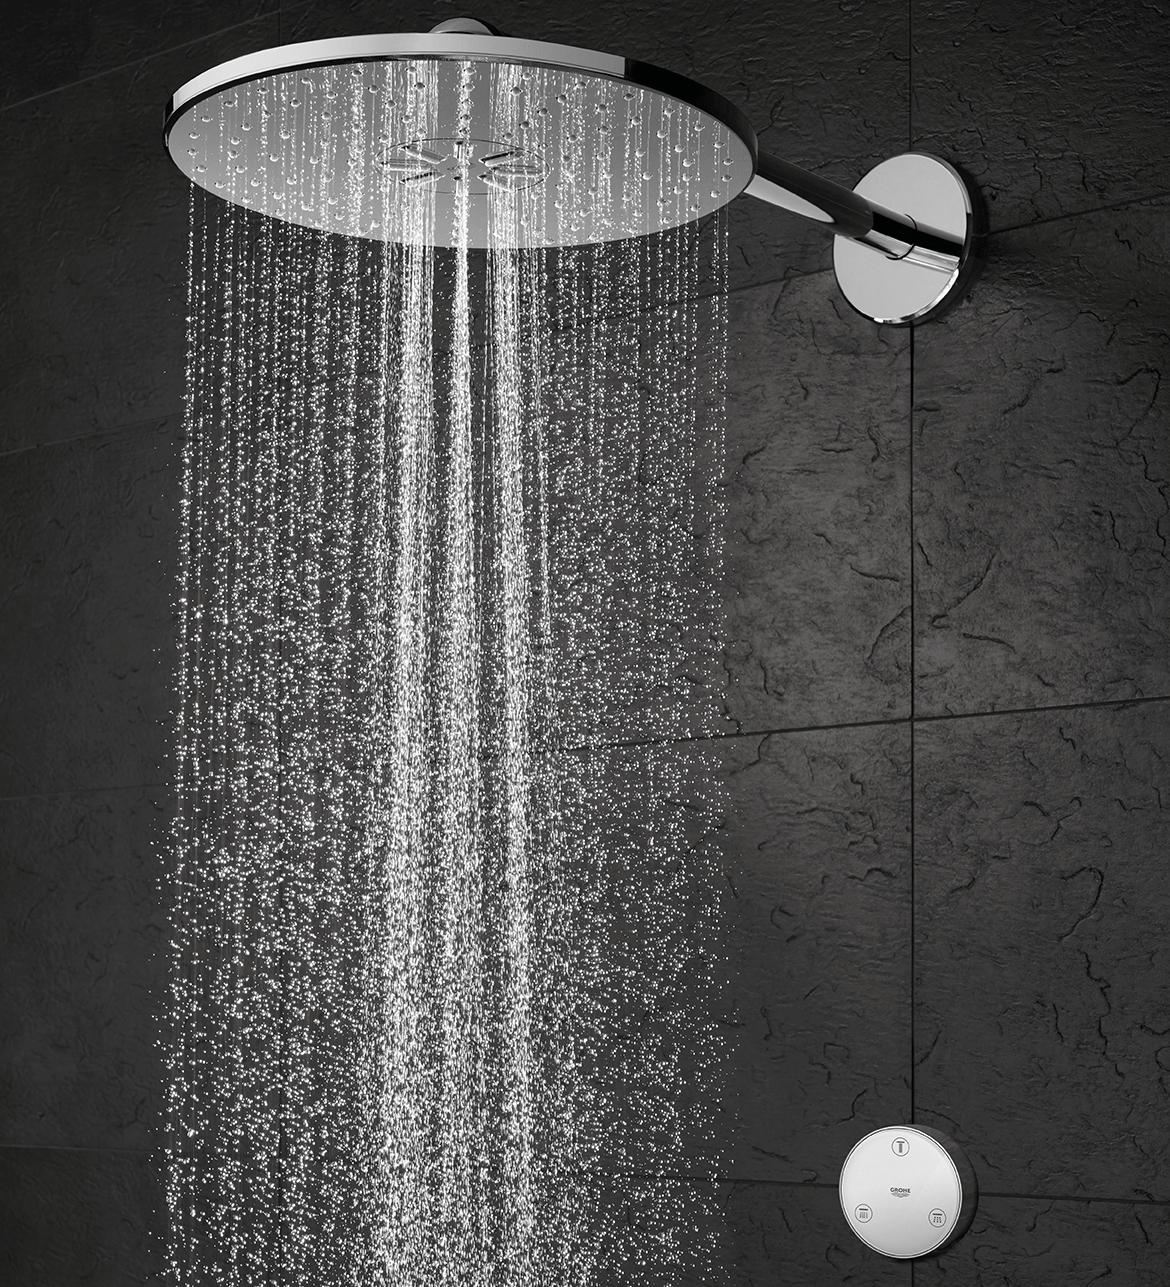 smarcontrol shower